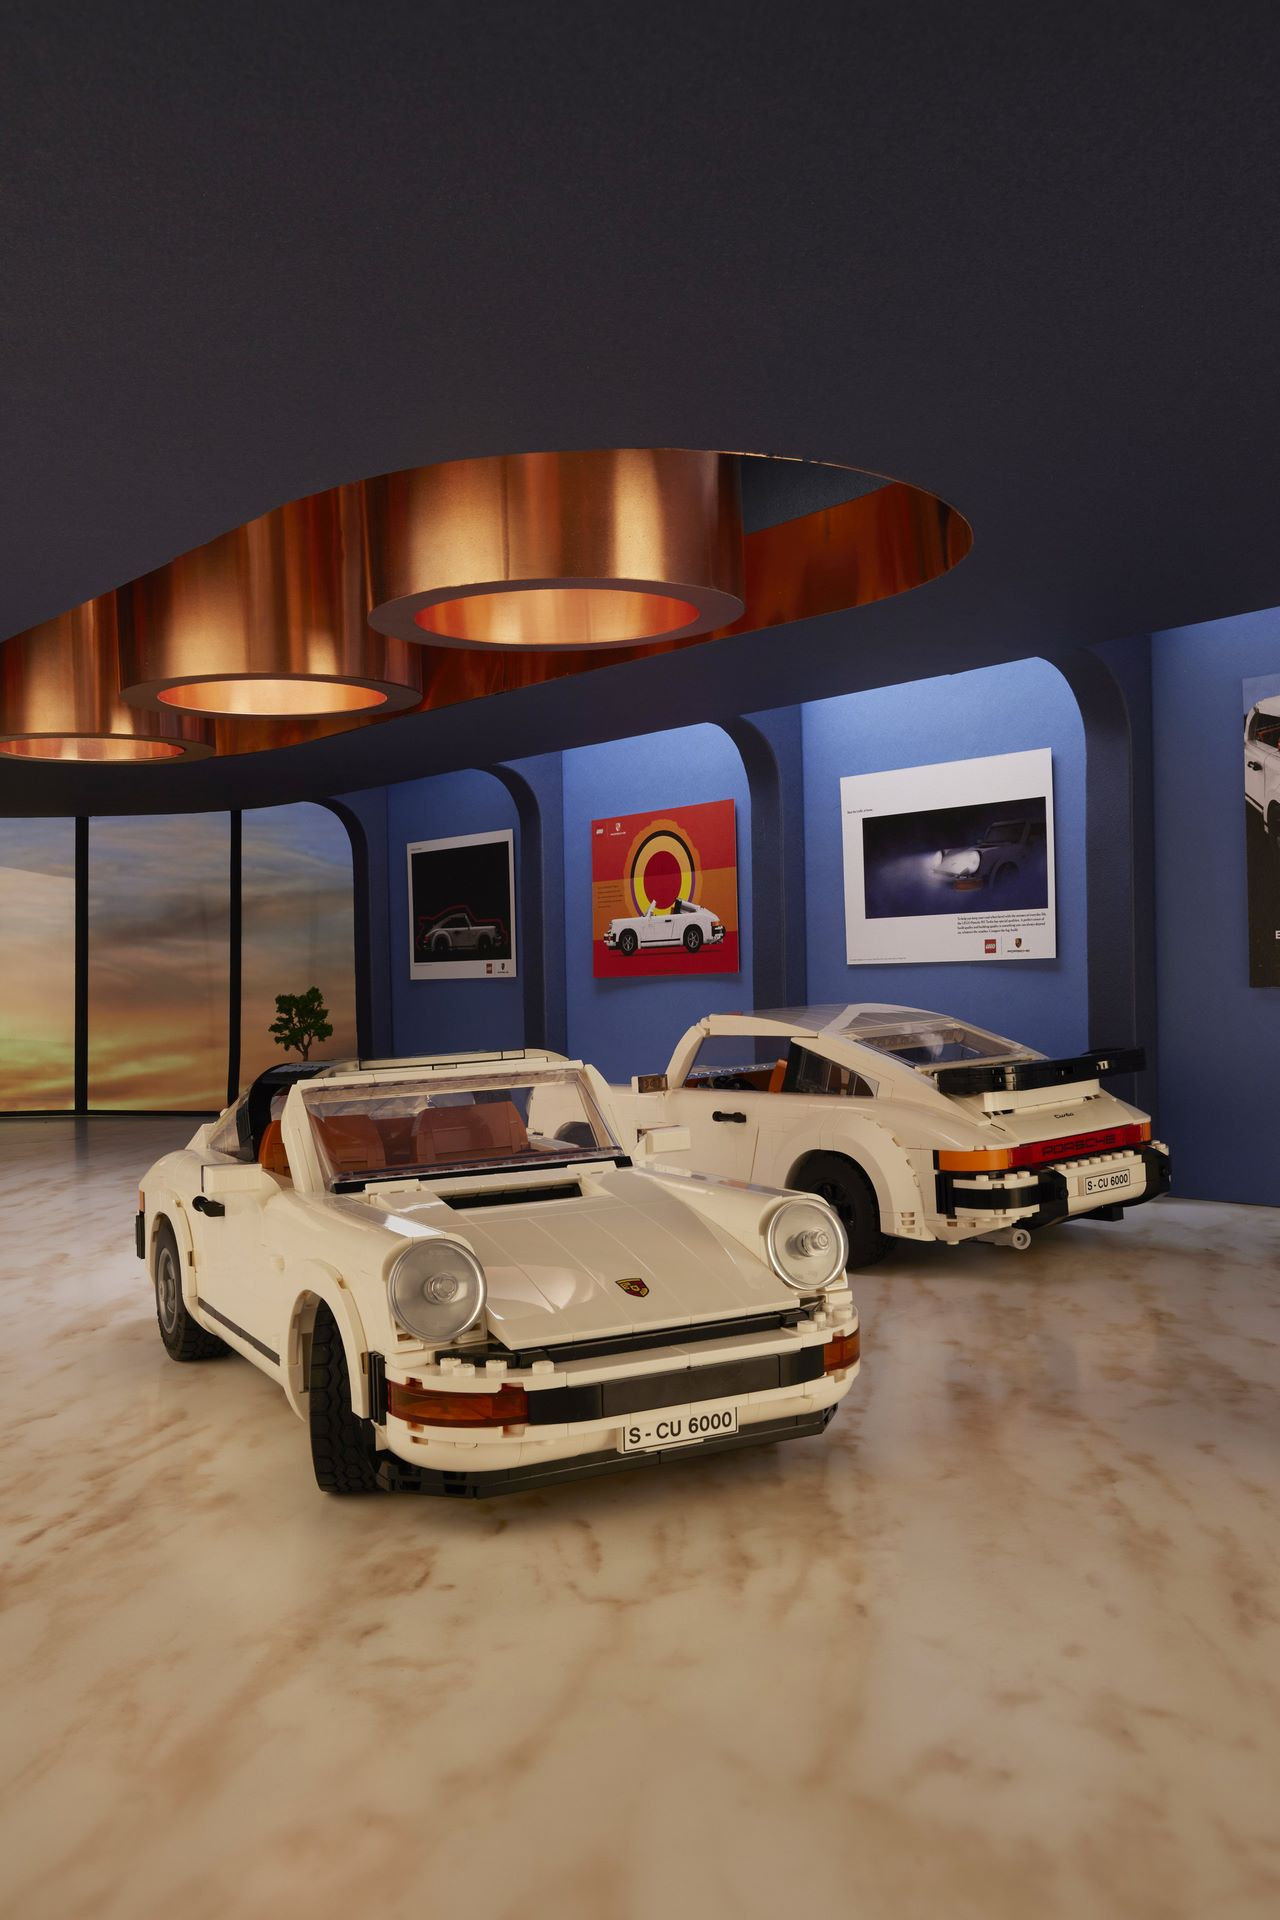 Porsche-911-Turbo-and-Targa-kit-3